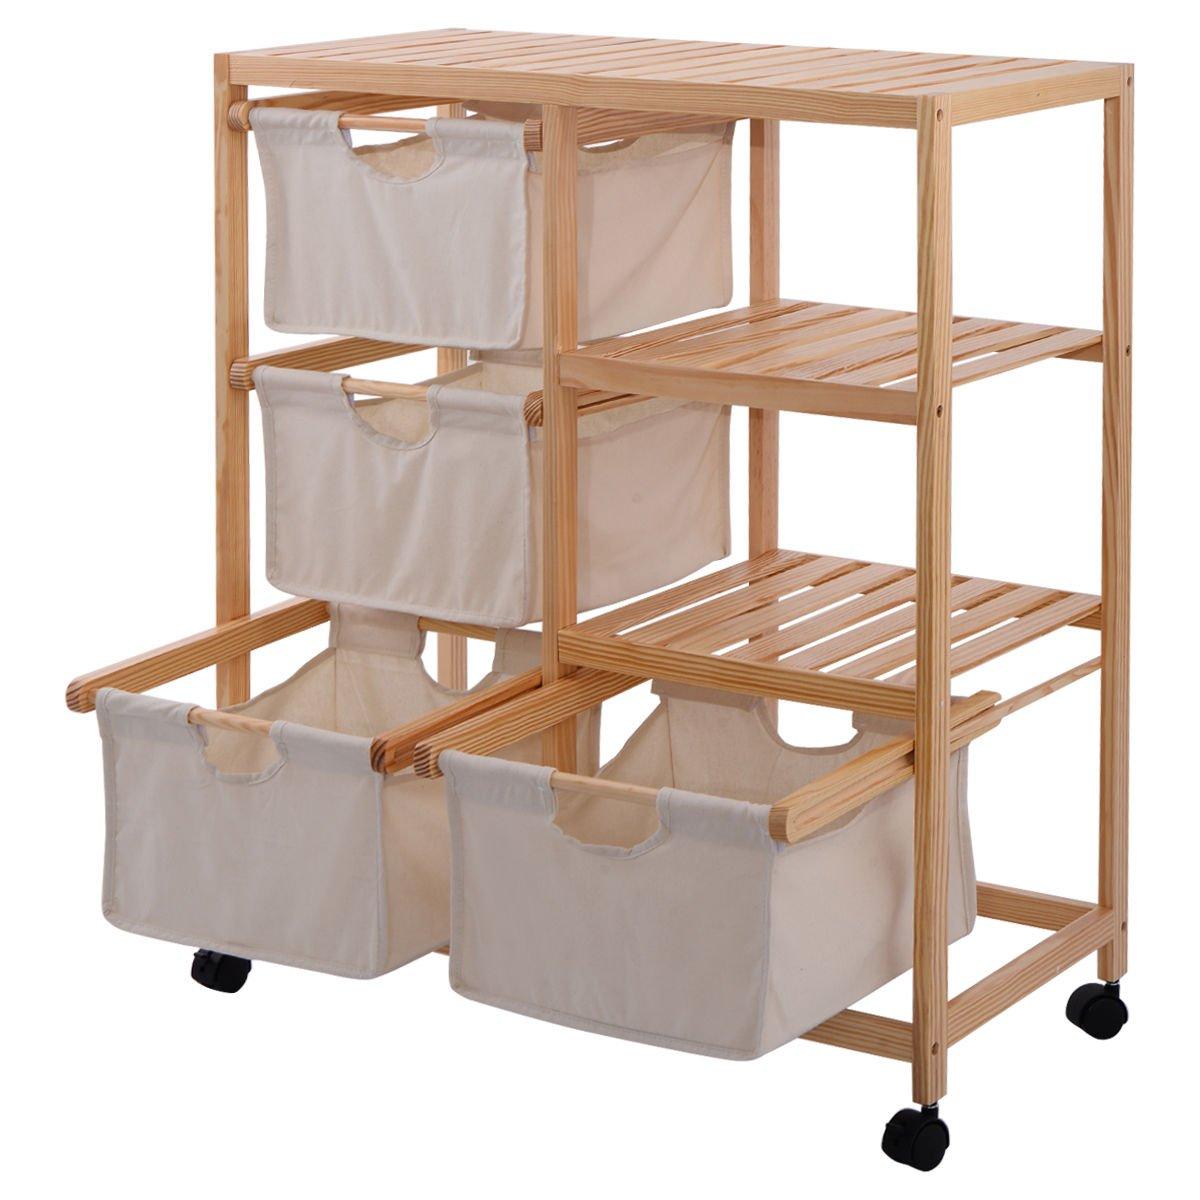 AyaMastro 6-Section Wood Hamper Storage Shelve w/ 4 Fabric Drawer & 2 Open Shelf with Ebook